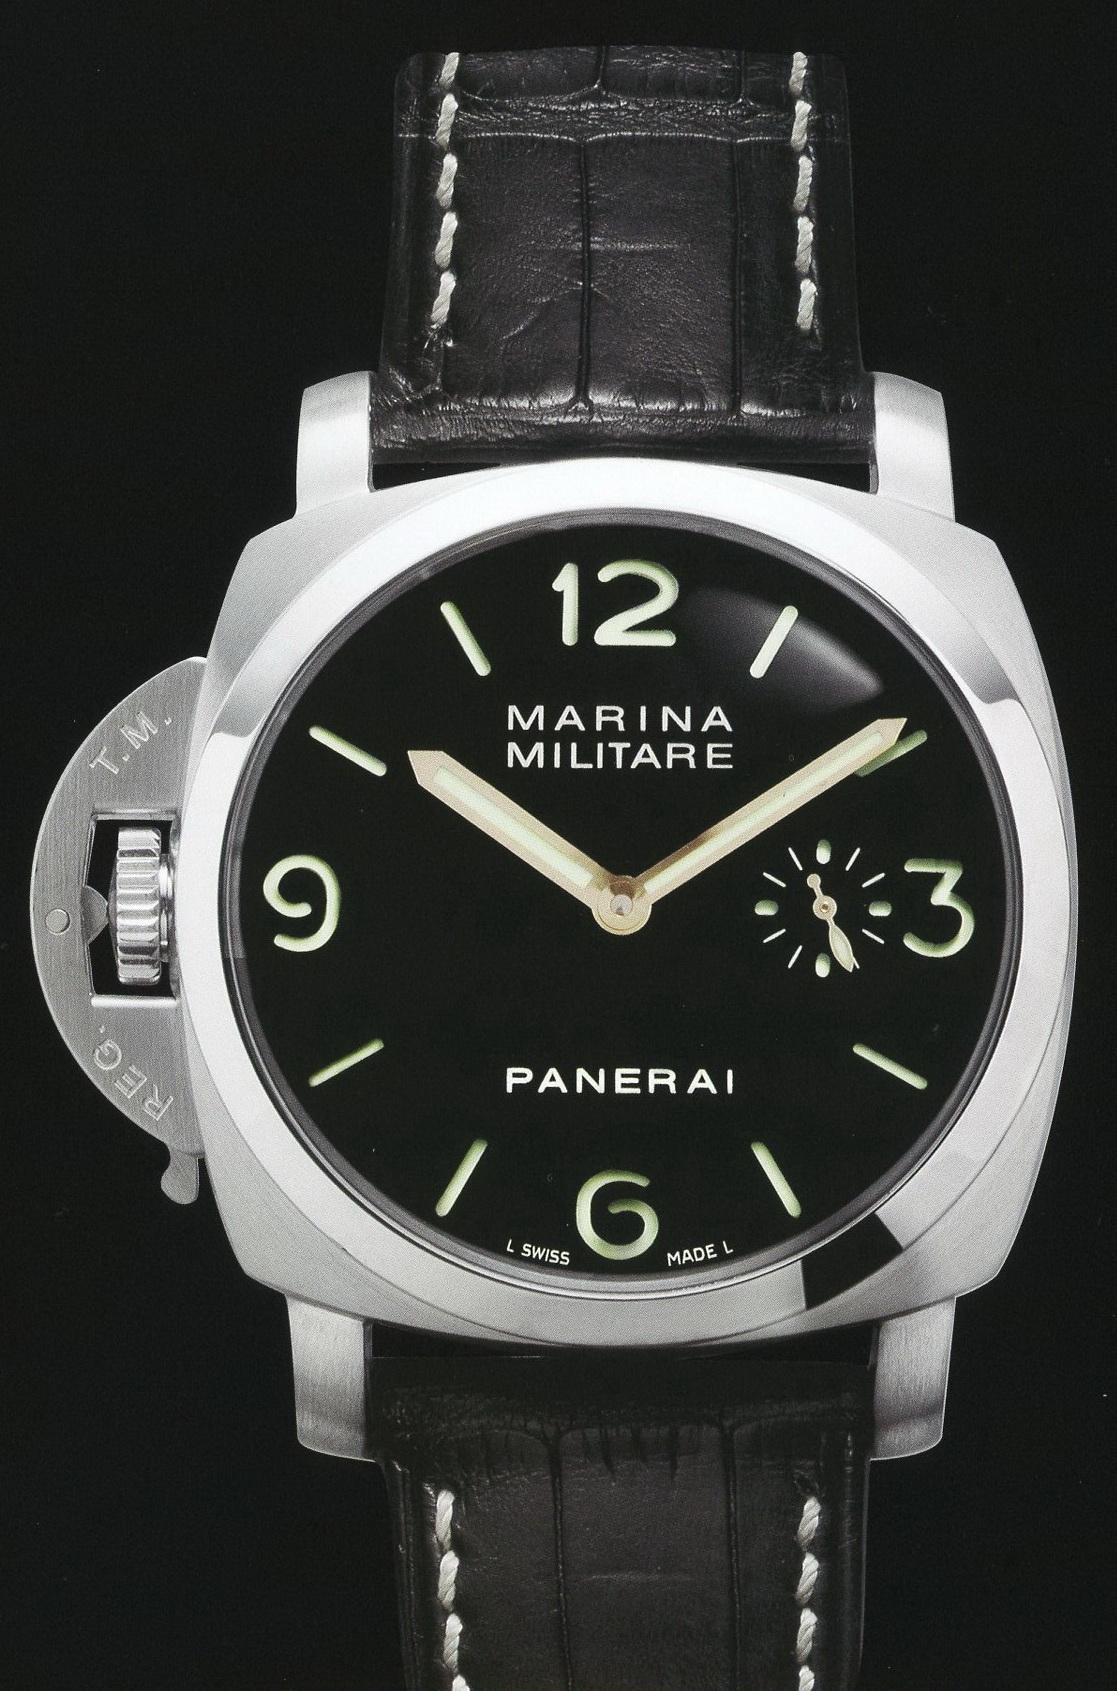 ���� Panerai 2005 Special Edition Luminor Marina Militare